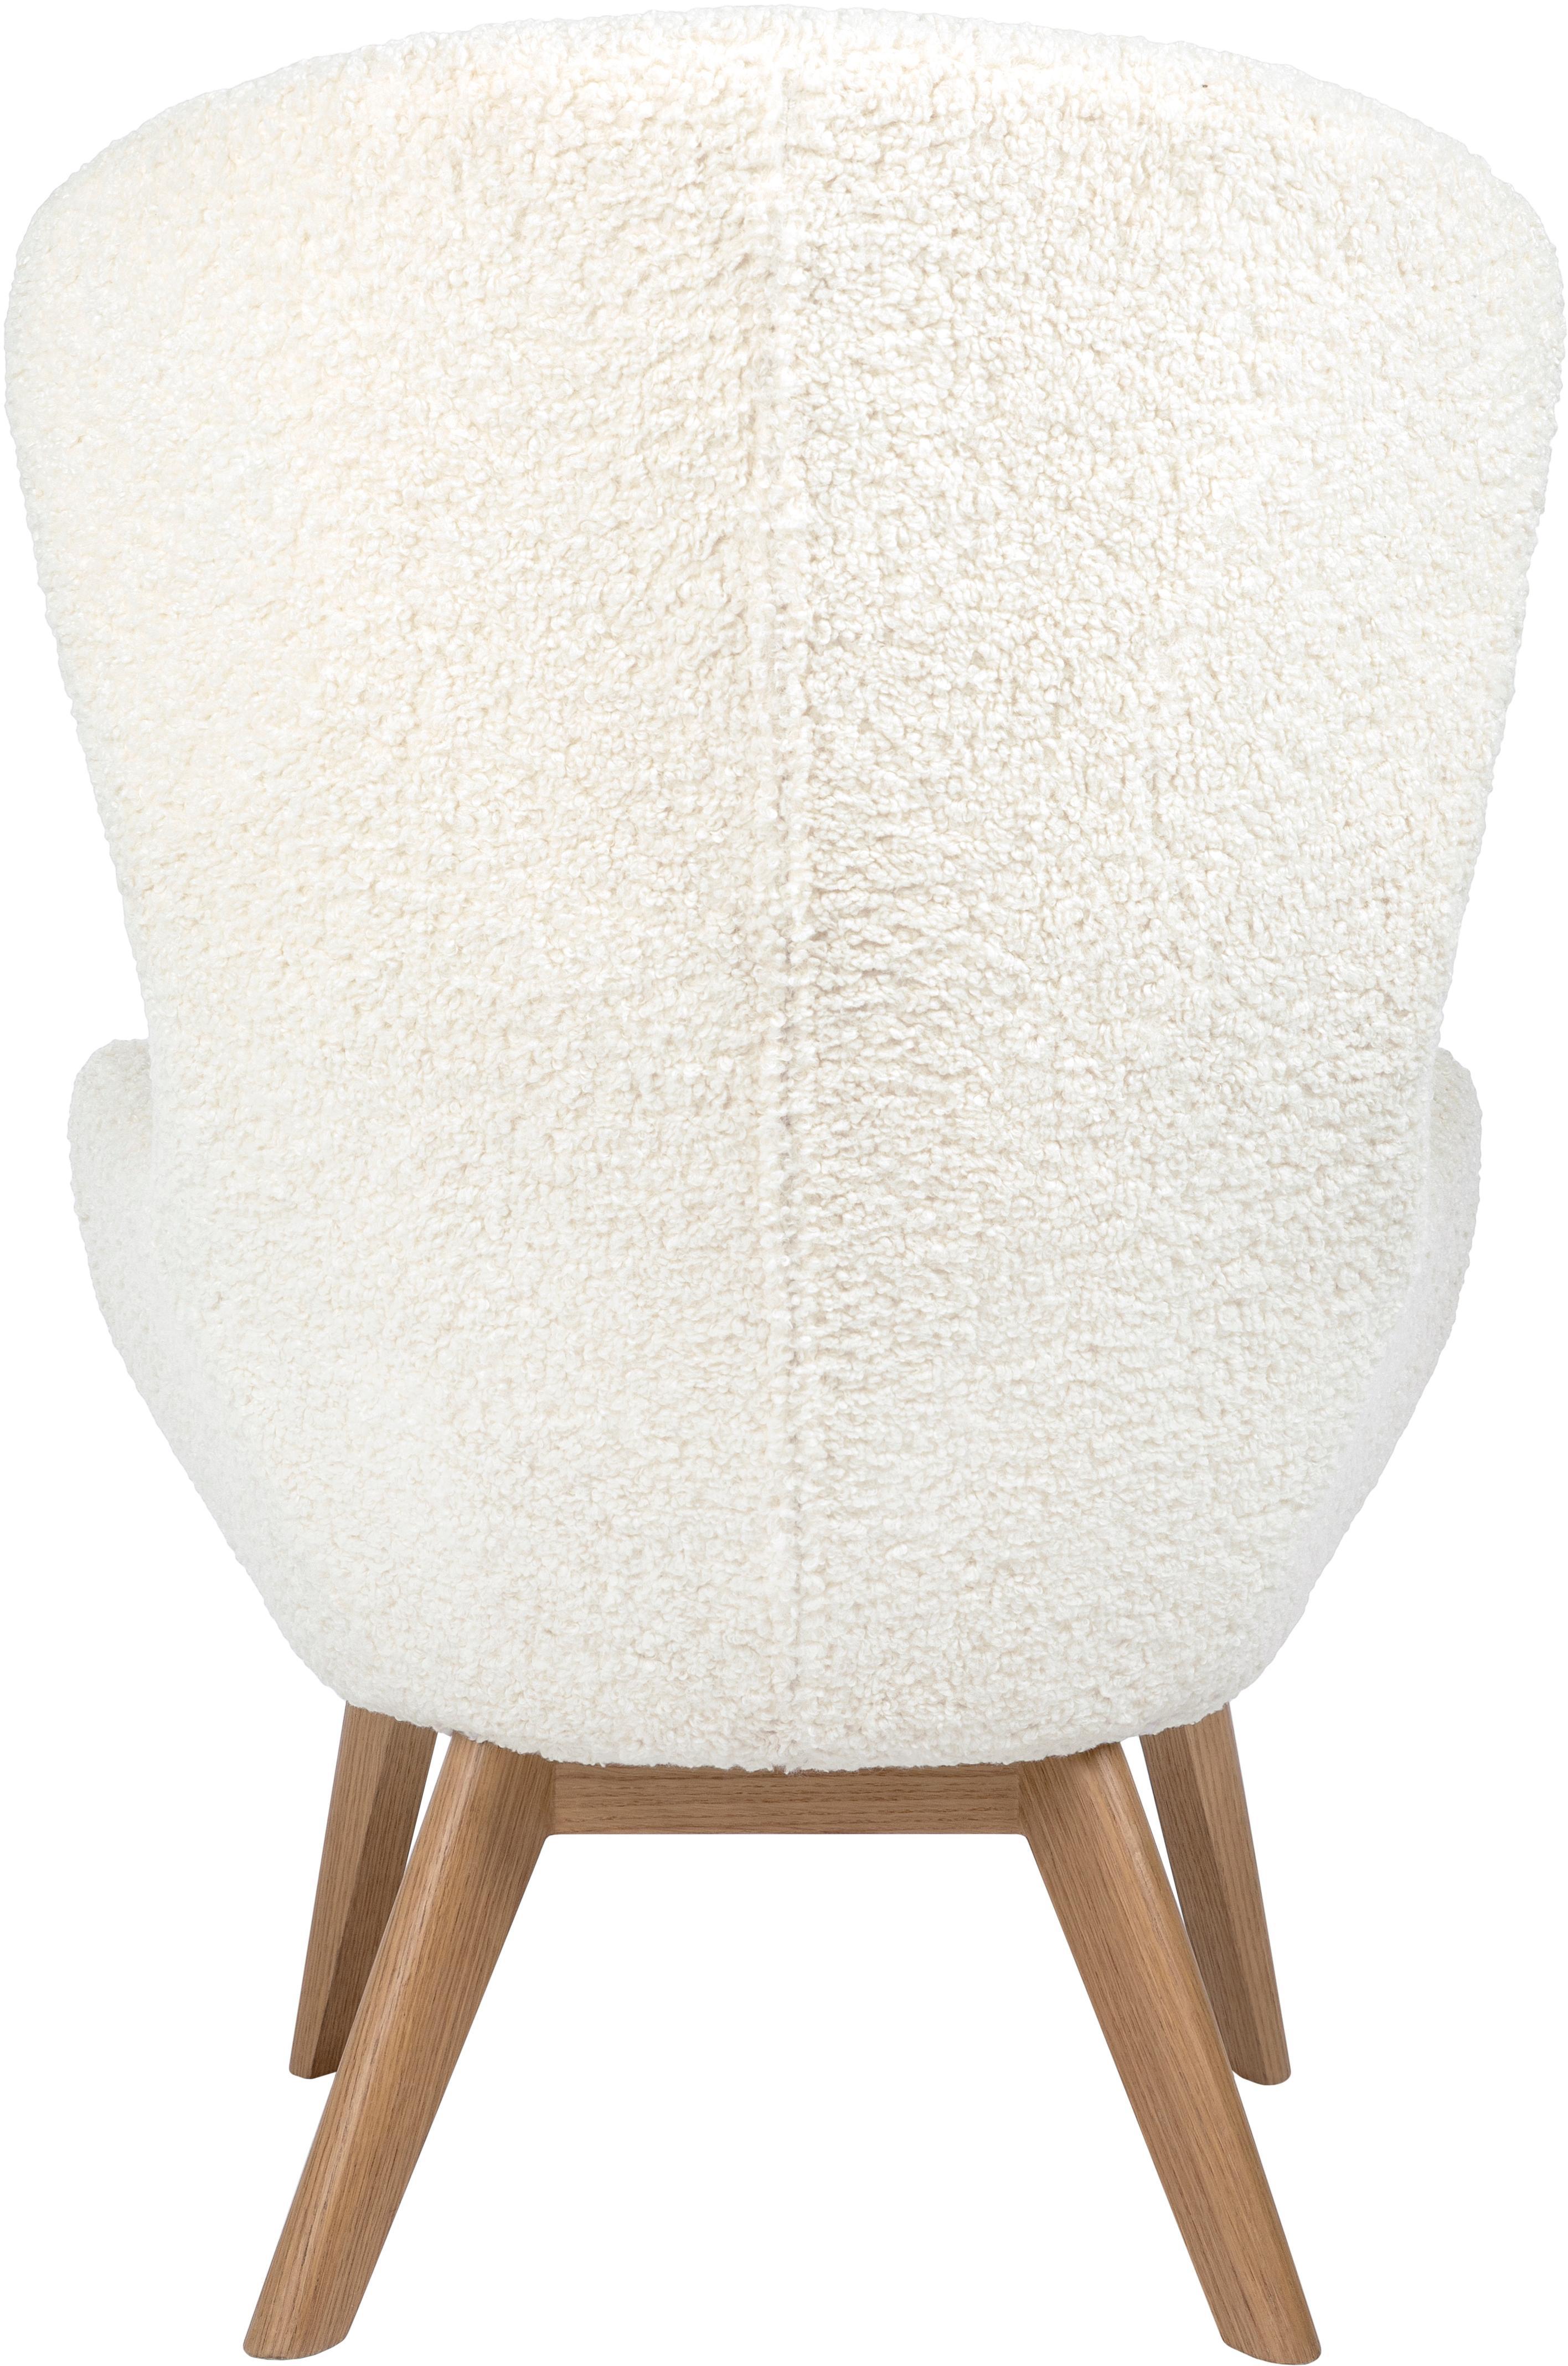 Teddy-Ohrensessel Wing, Bezug: Polyester (Teddyfell), Füße: Massivholz mit Eschenfurn, Cremeweiß, 77 x 106 cm